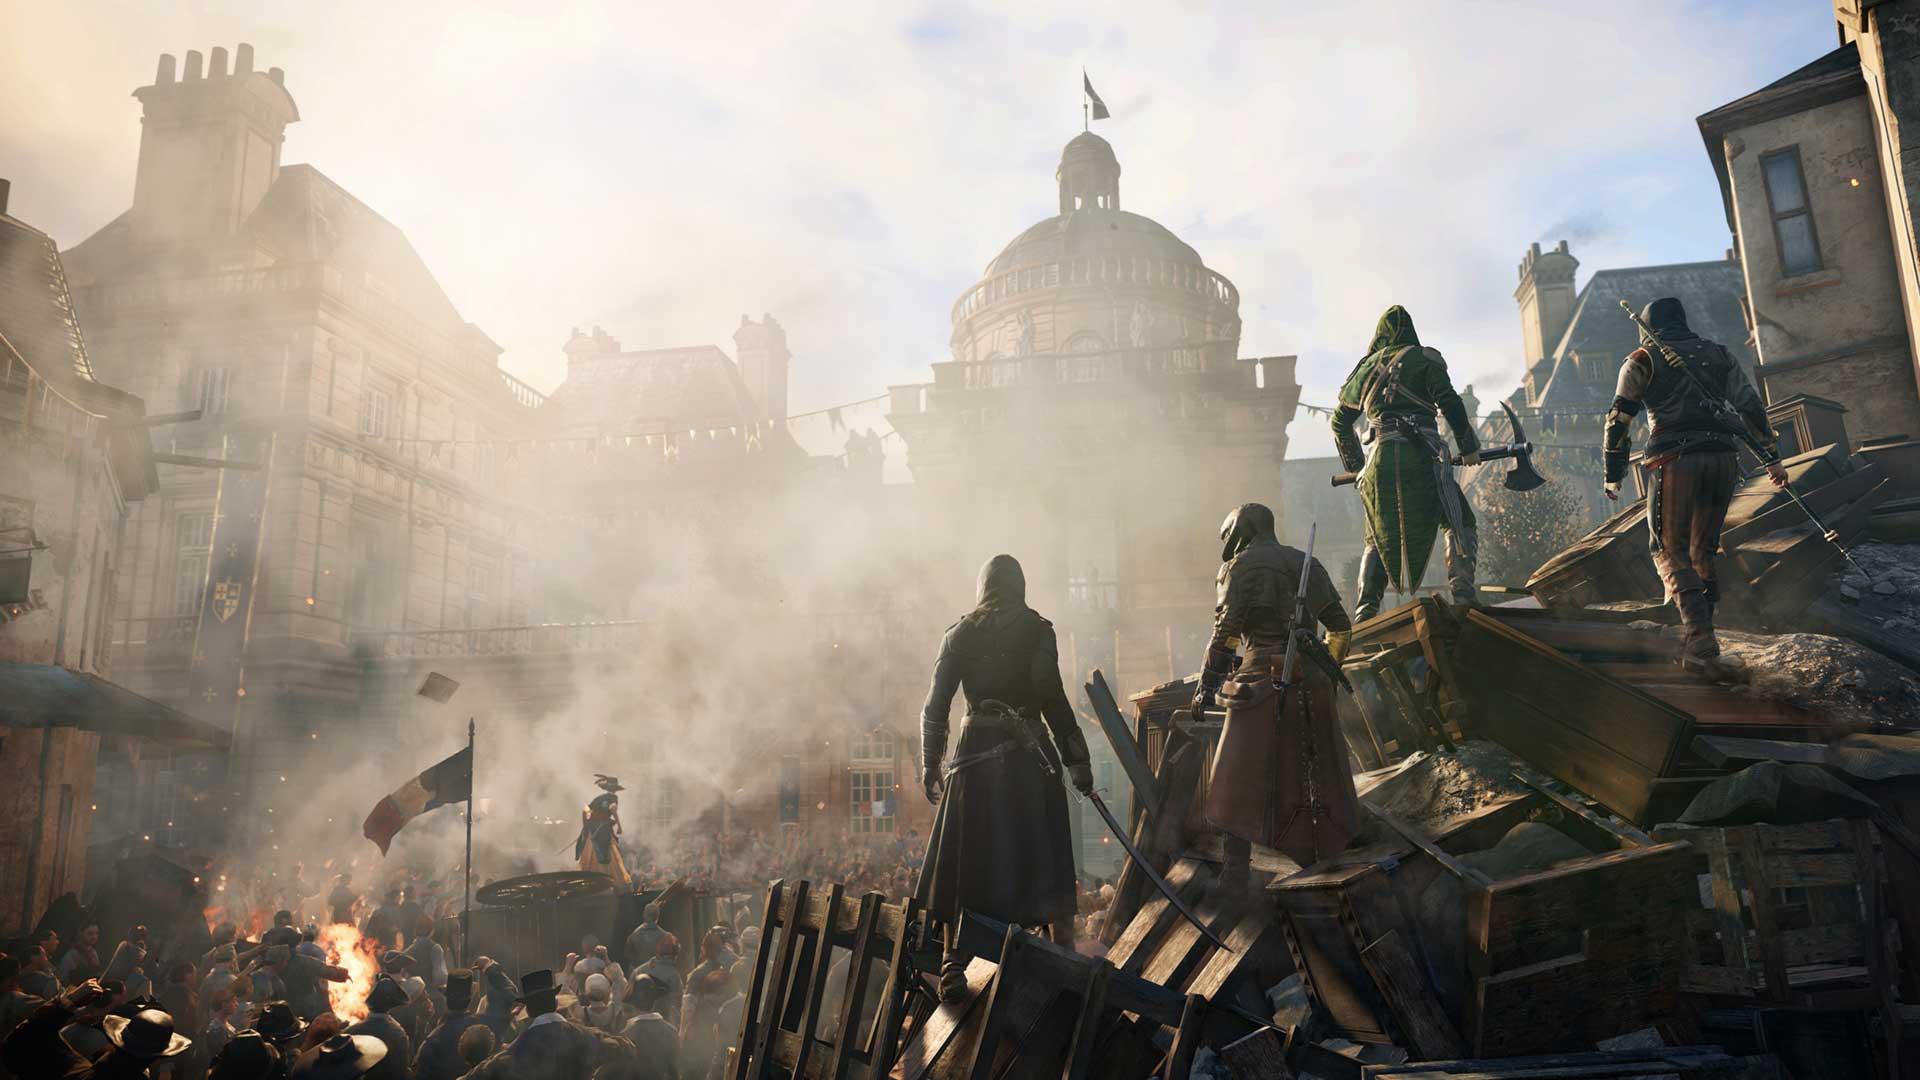 [FIXO] Assassin's Creed Unity ACU-media-SS-7-big_147456